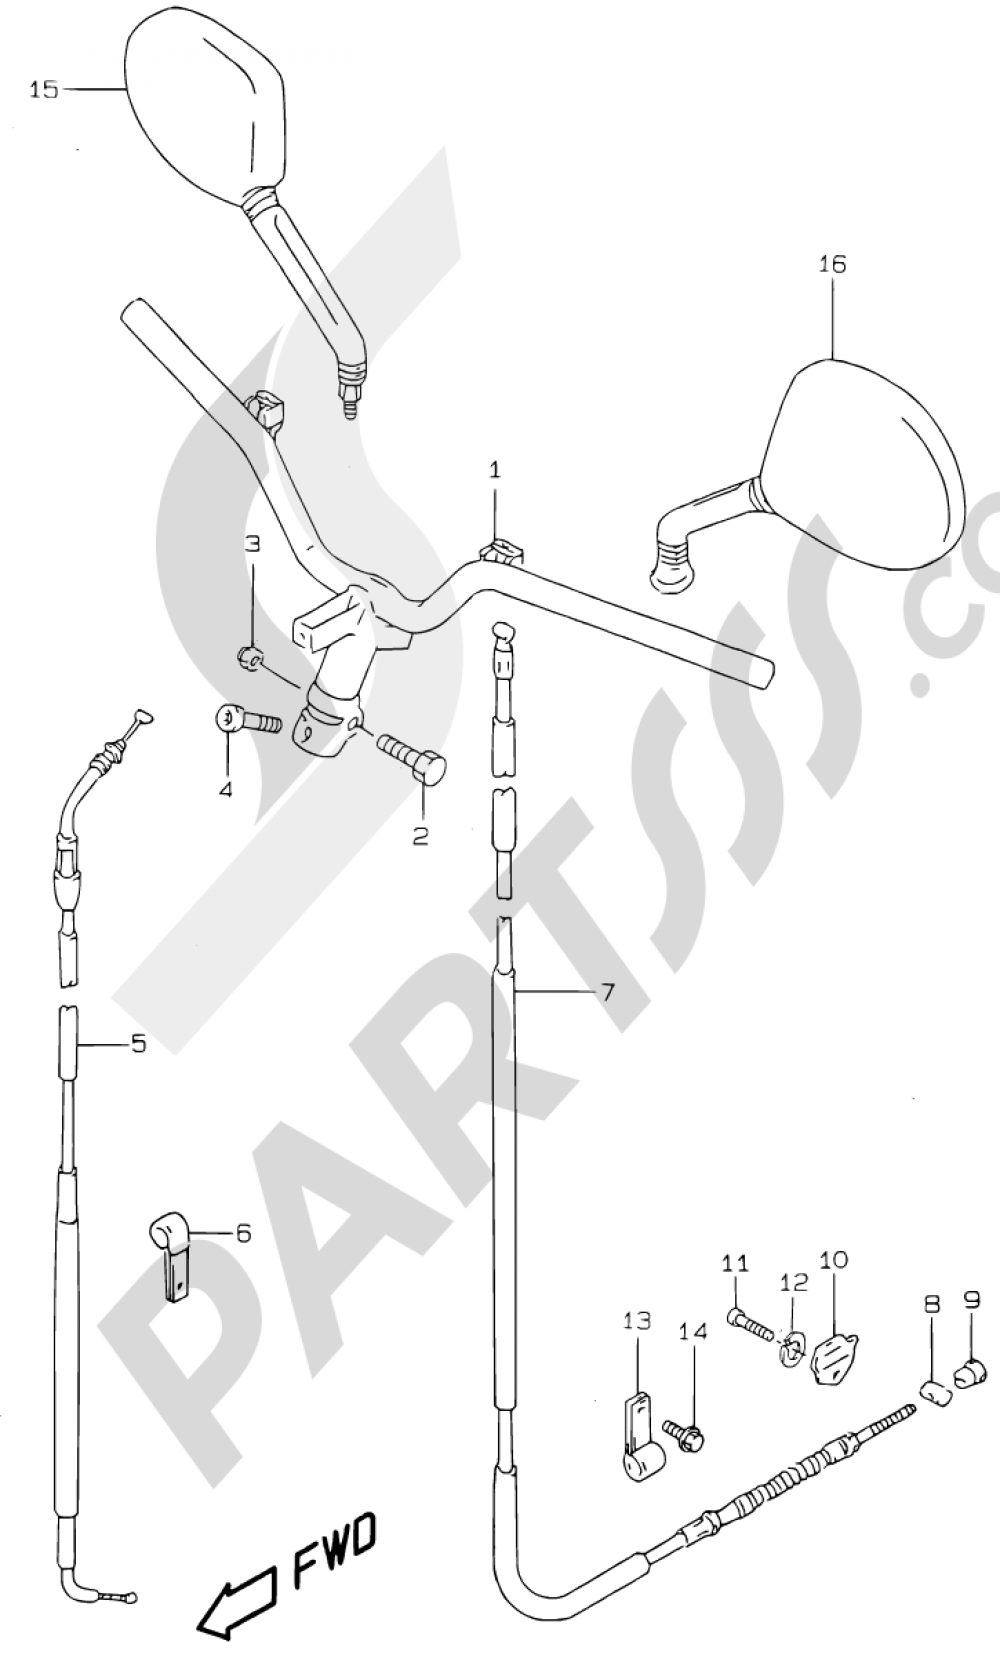 34 - HANDLEBAR (MODEL V/W  AND MODEL AY50 X/Y/K1) Suzuki KATANA AY50 2000